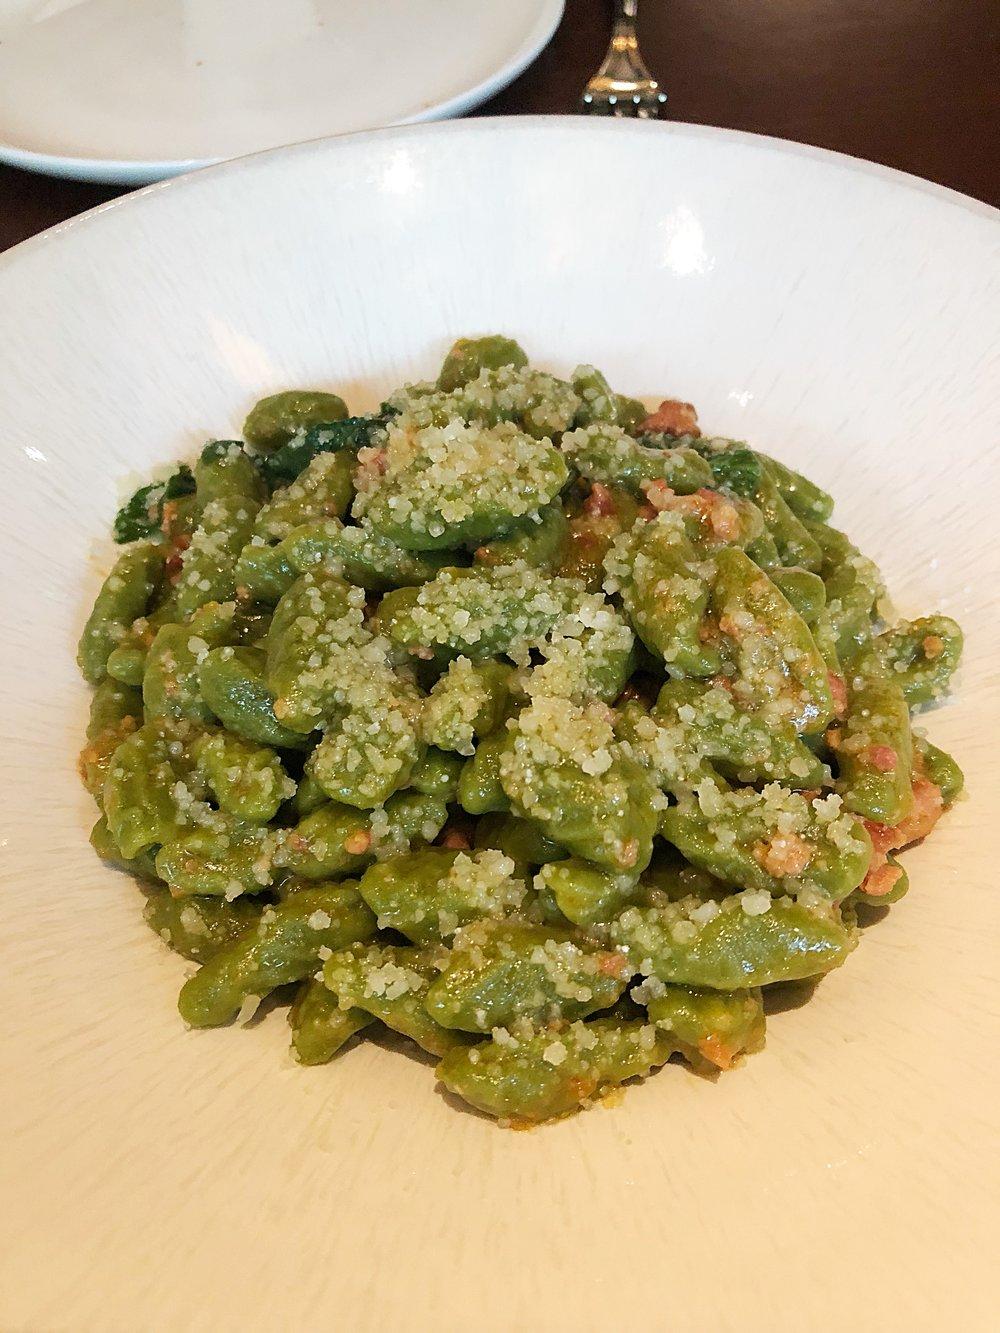 Cavatelli verde, lamb, mint, spinach